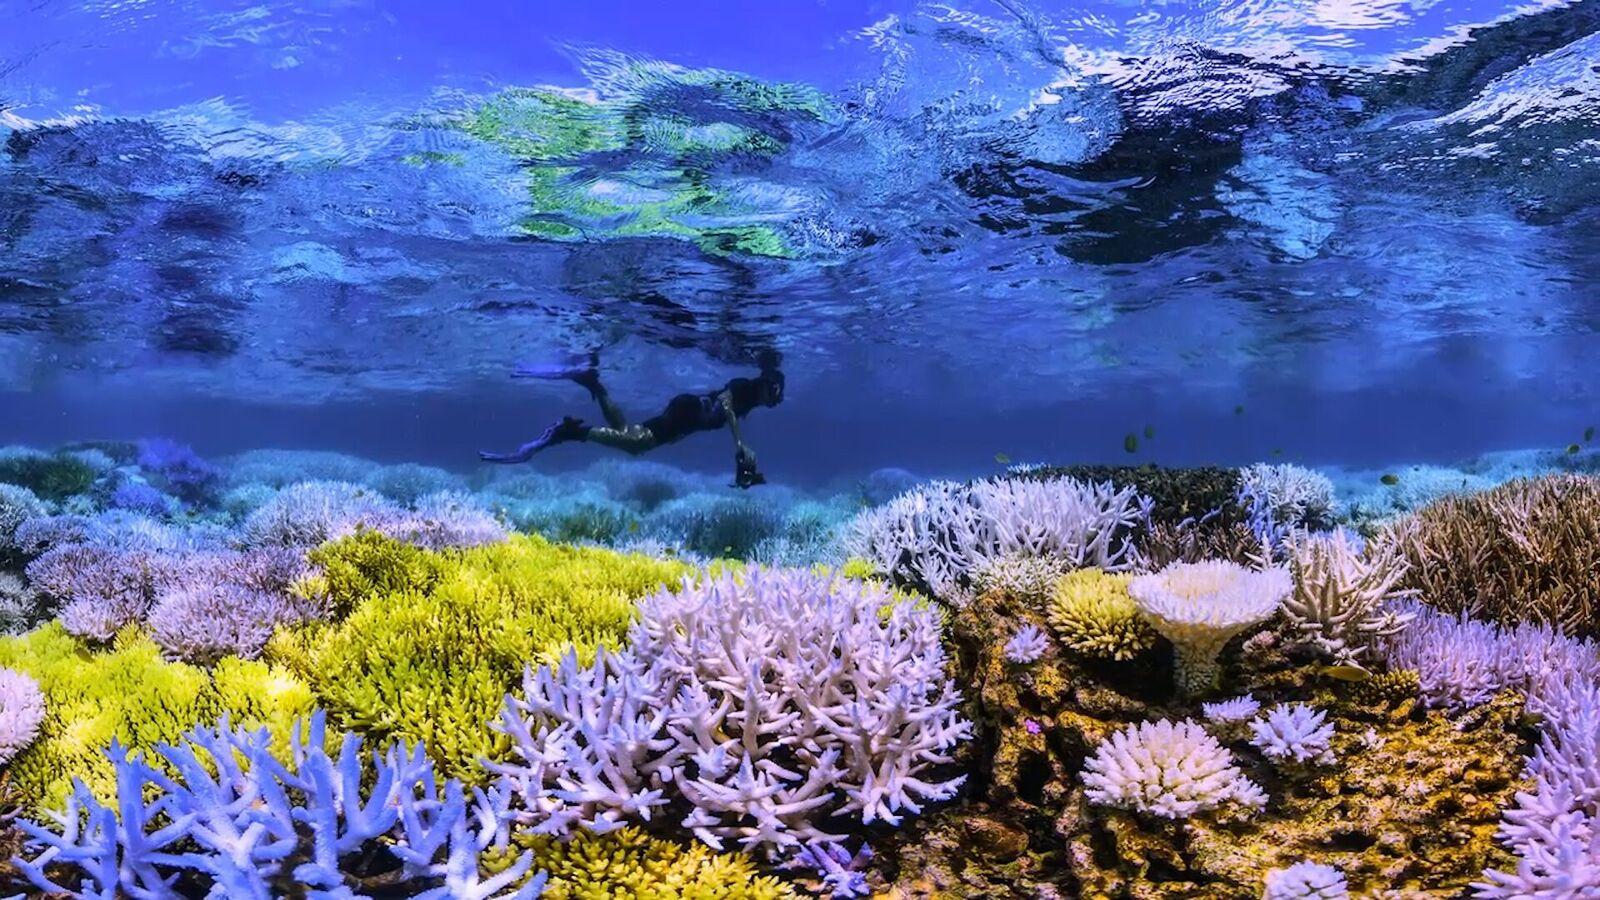 Flourescing Coral - Credit Netflix_preview.jpeg